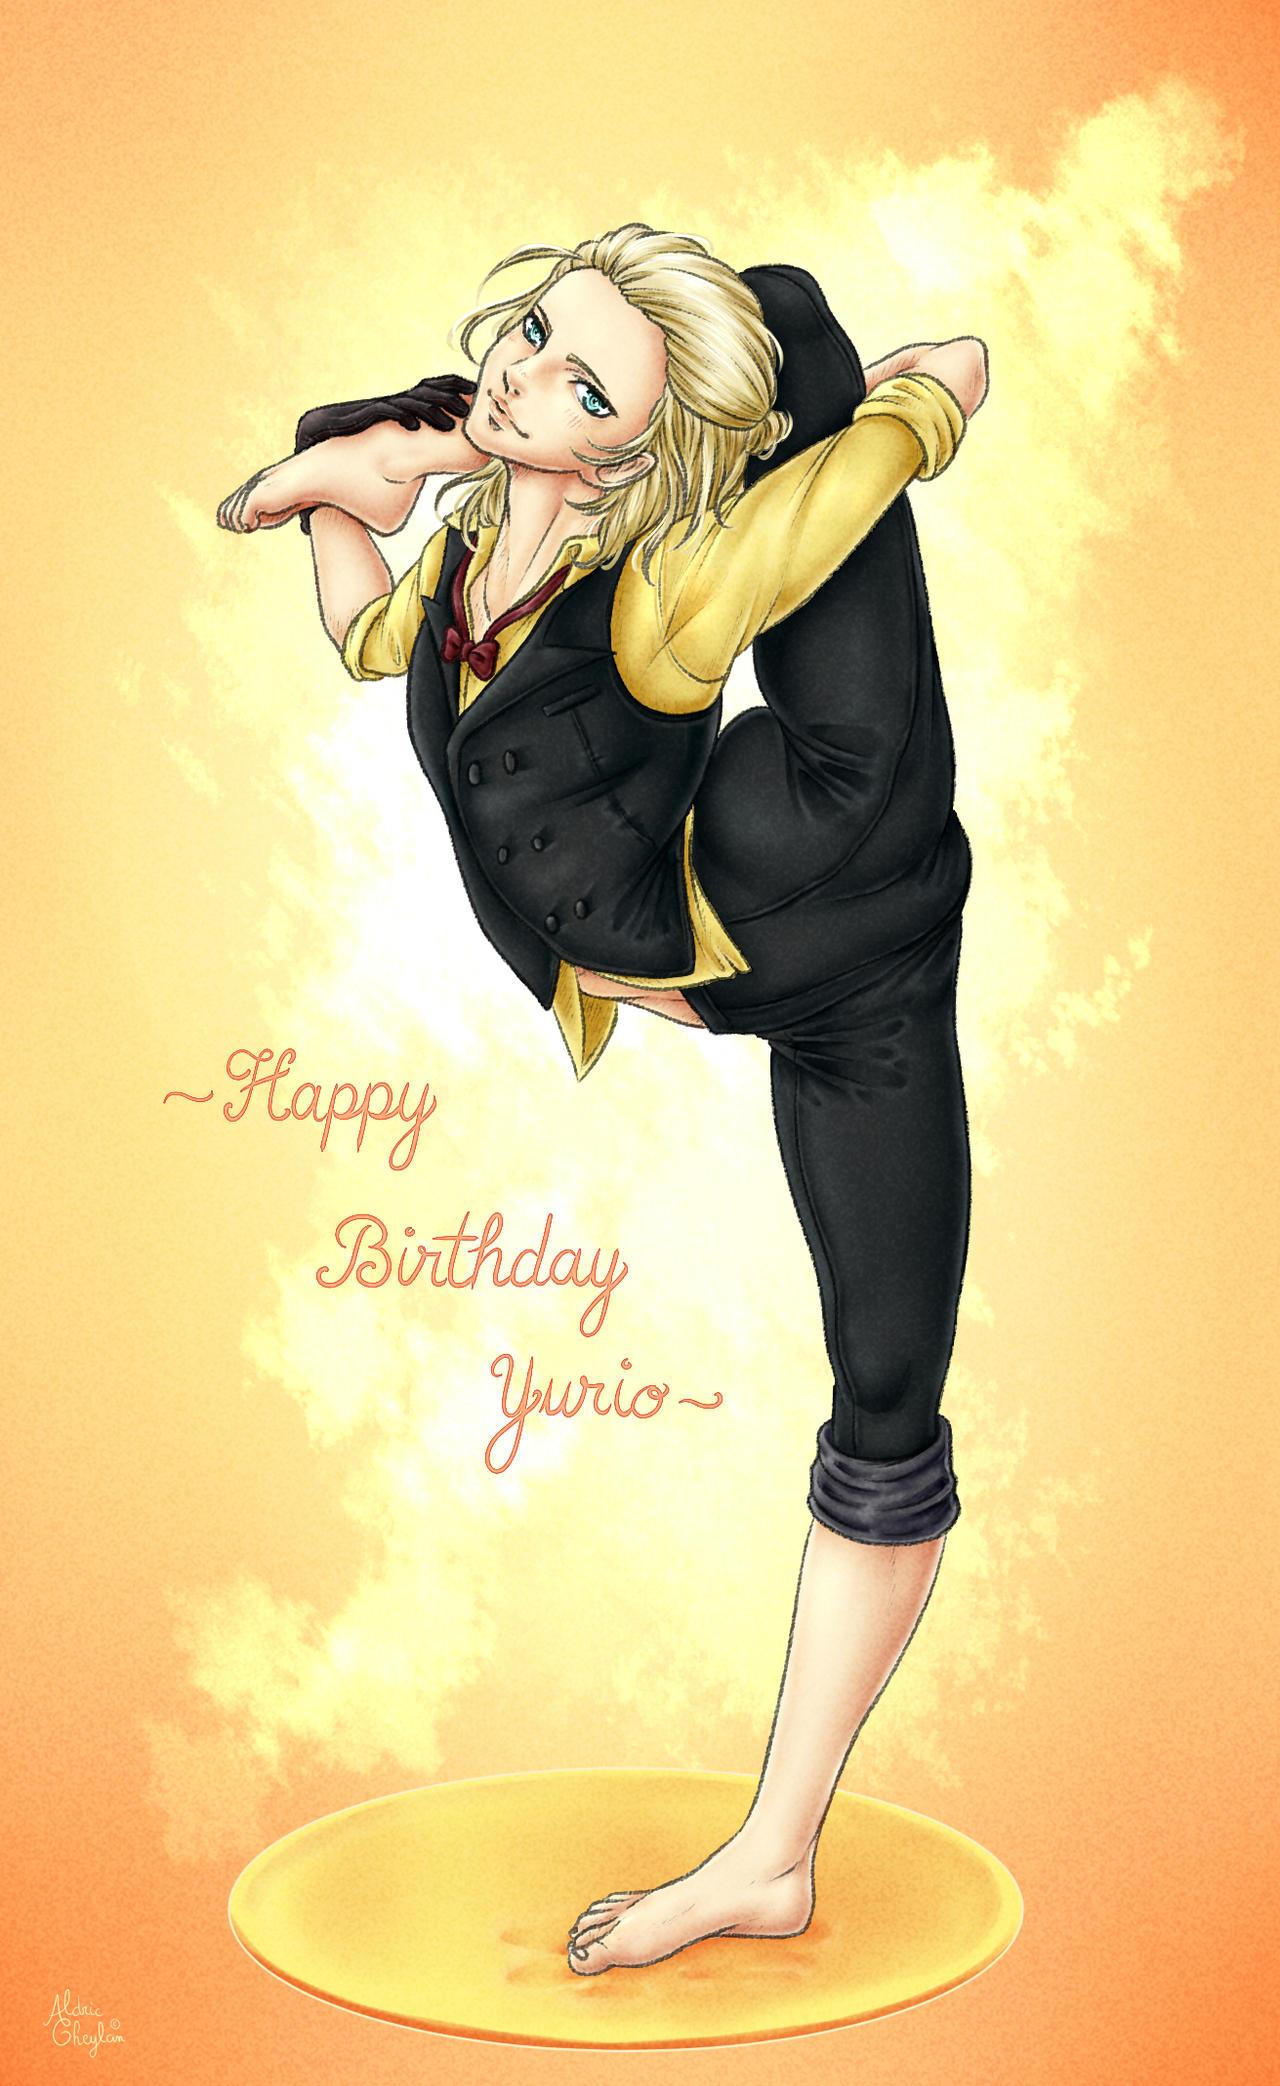 http://img02.deviantart.net/9b34/i/2017/059/b/f/happy_birthday_yurio_by_aldric_cheylan-db0qyti.jpg